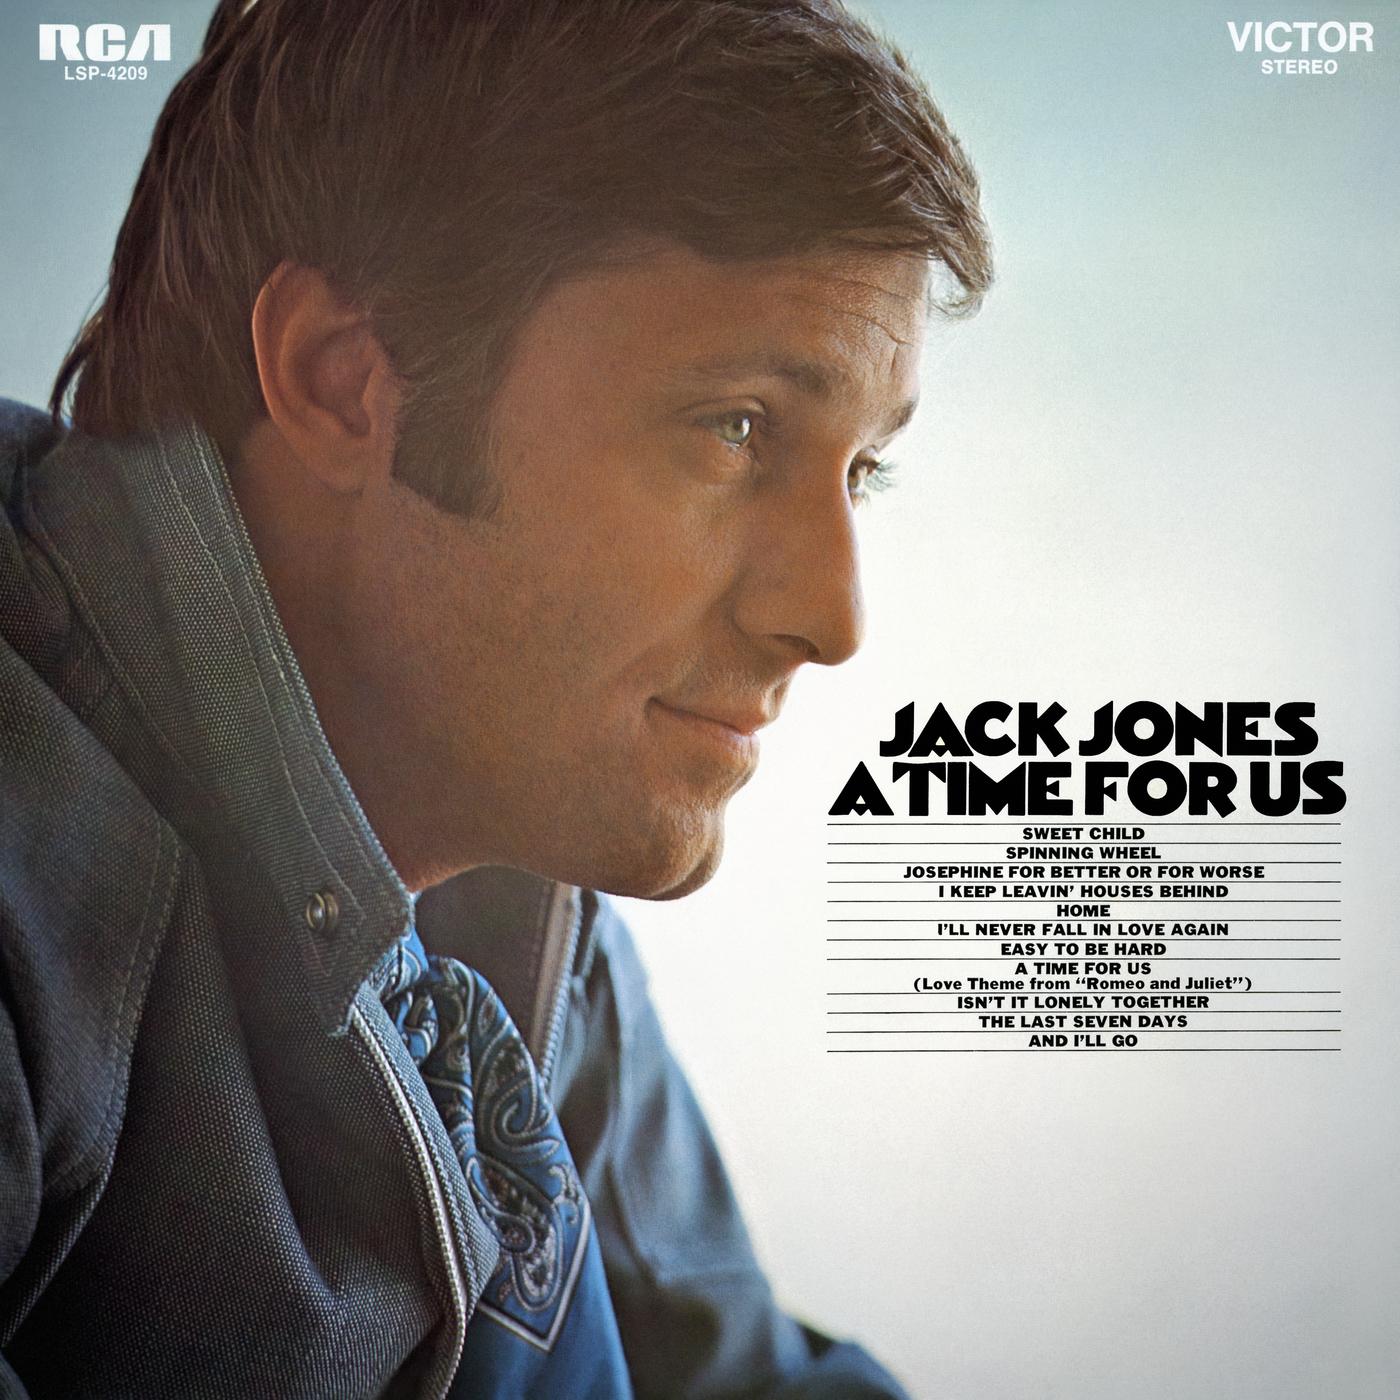 A Time for Us - Jack Jones